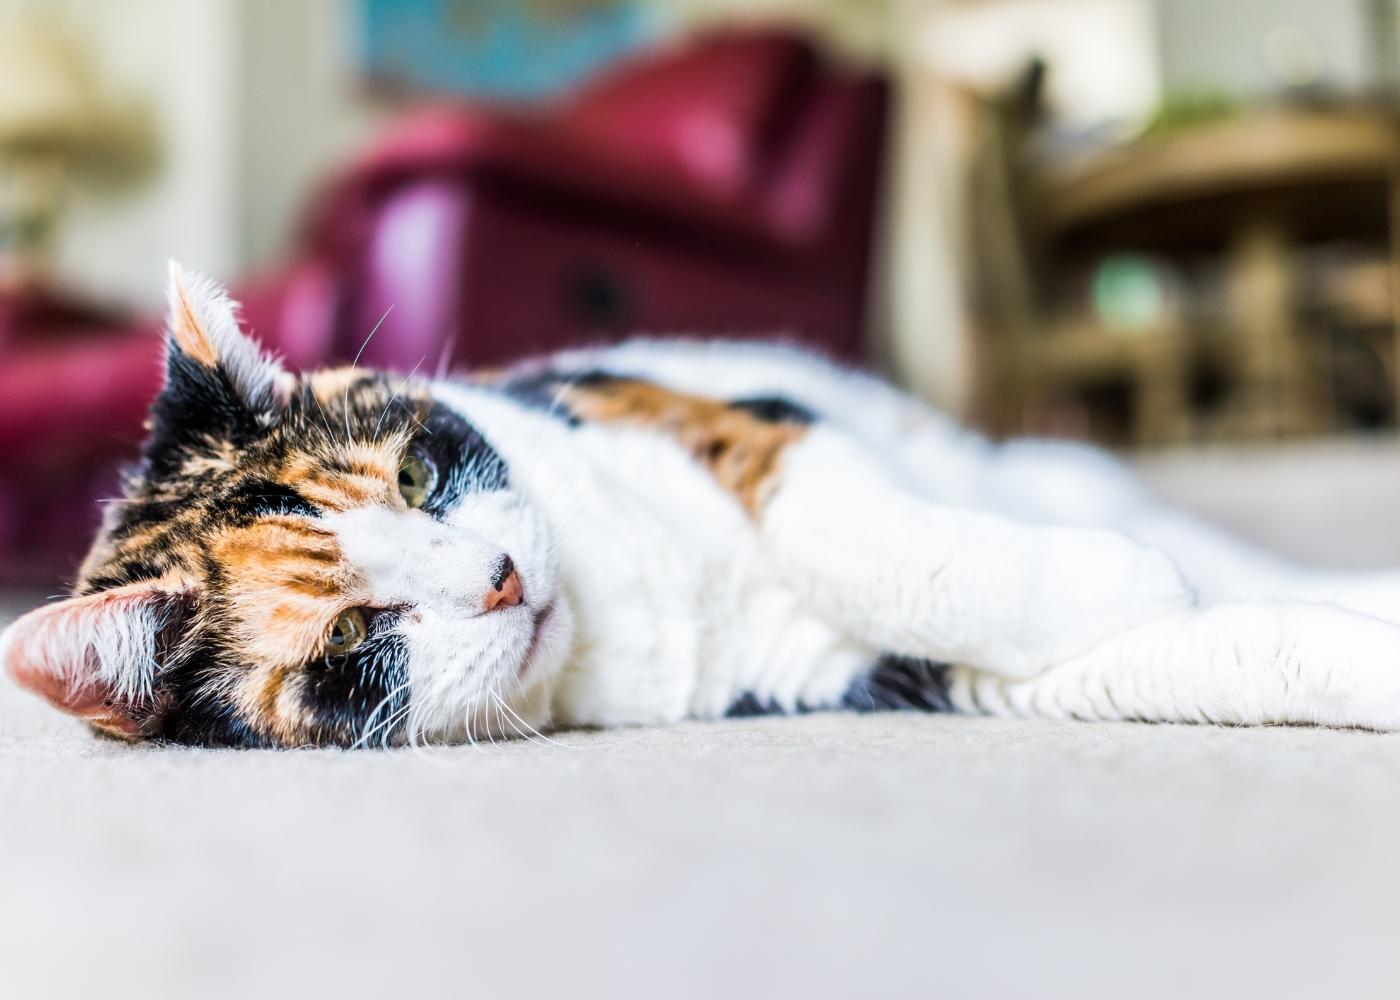 gato idoso deitado no chão da sala